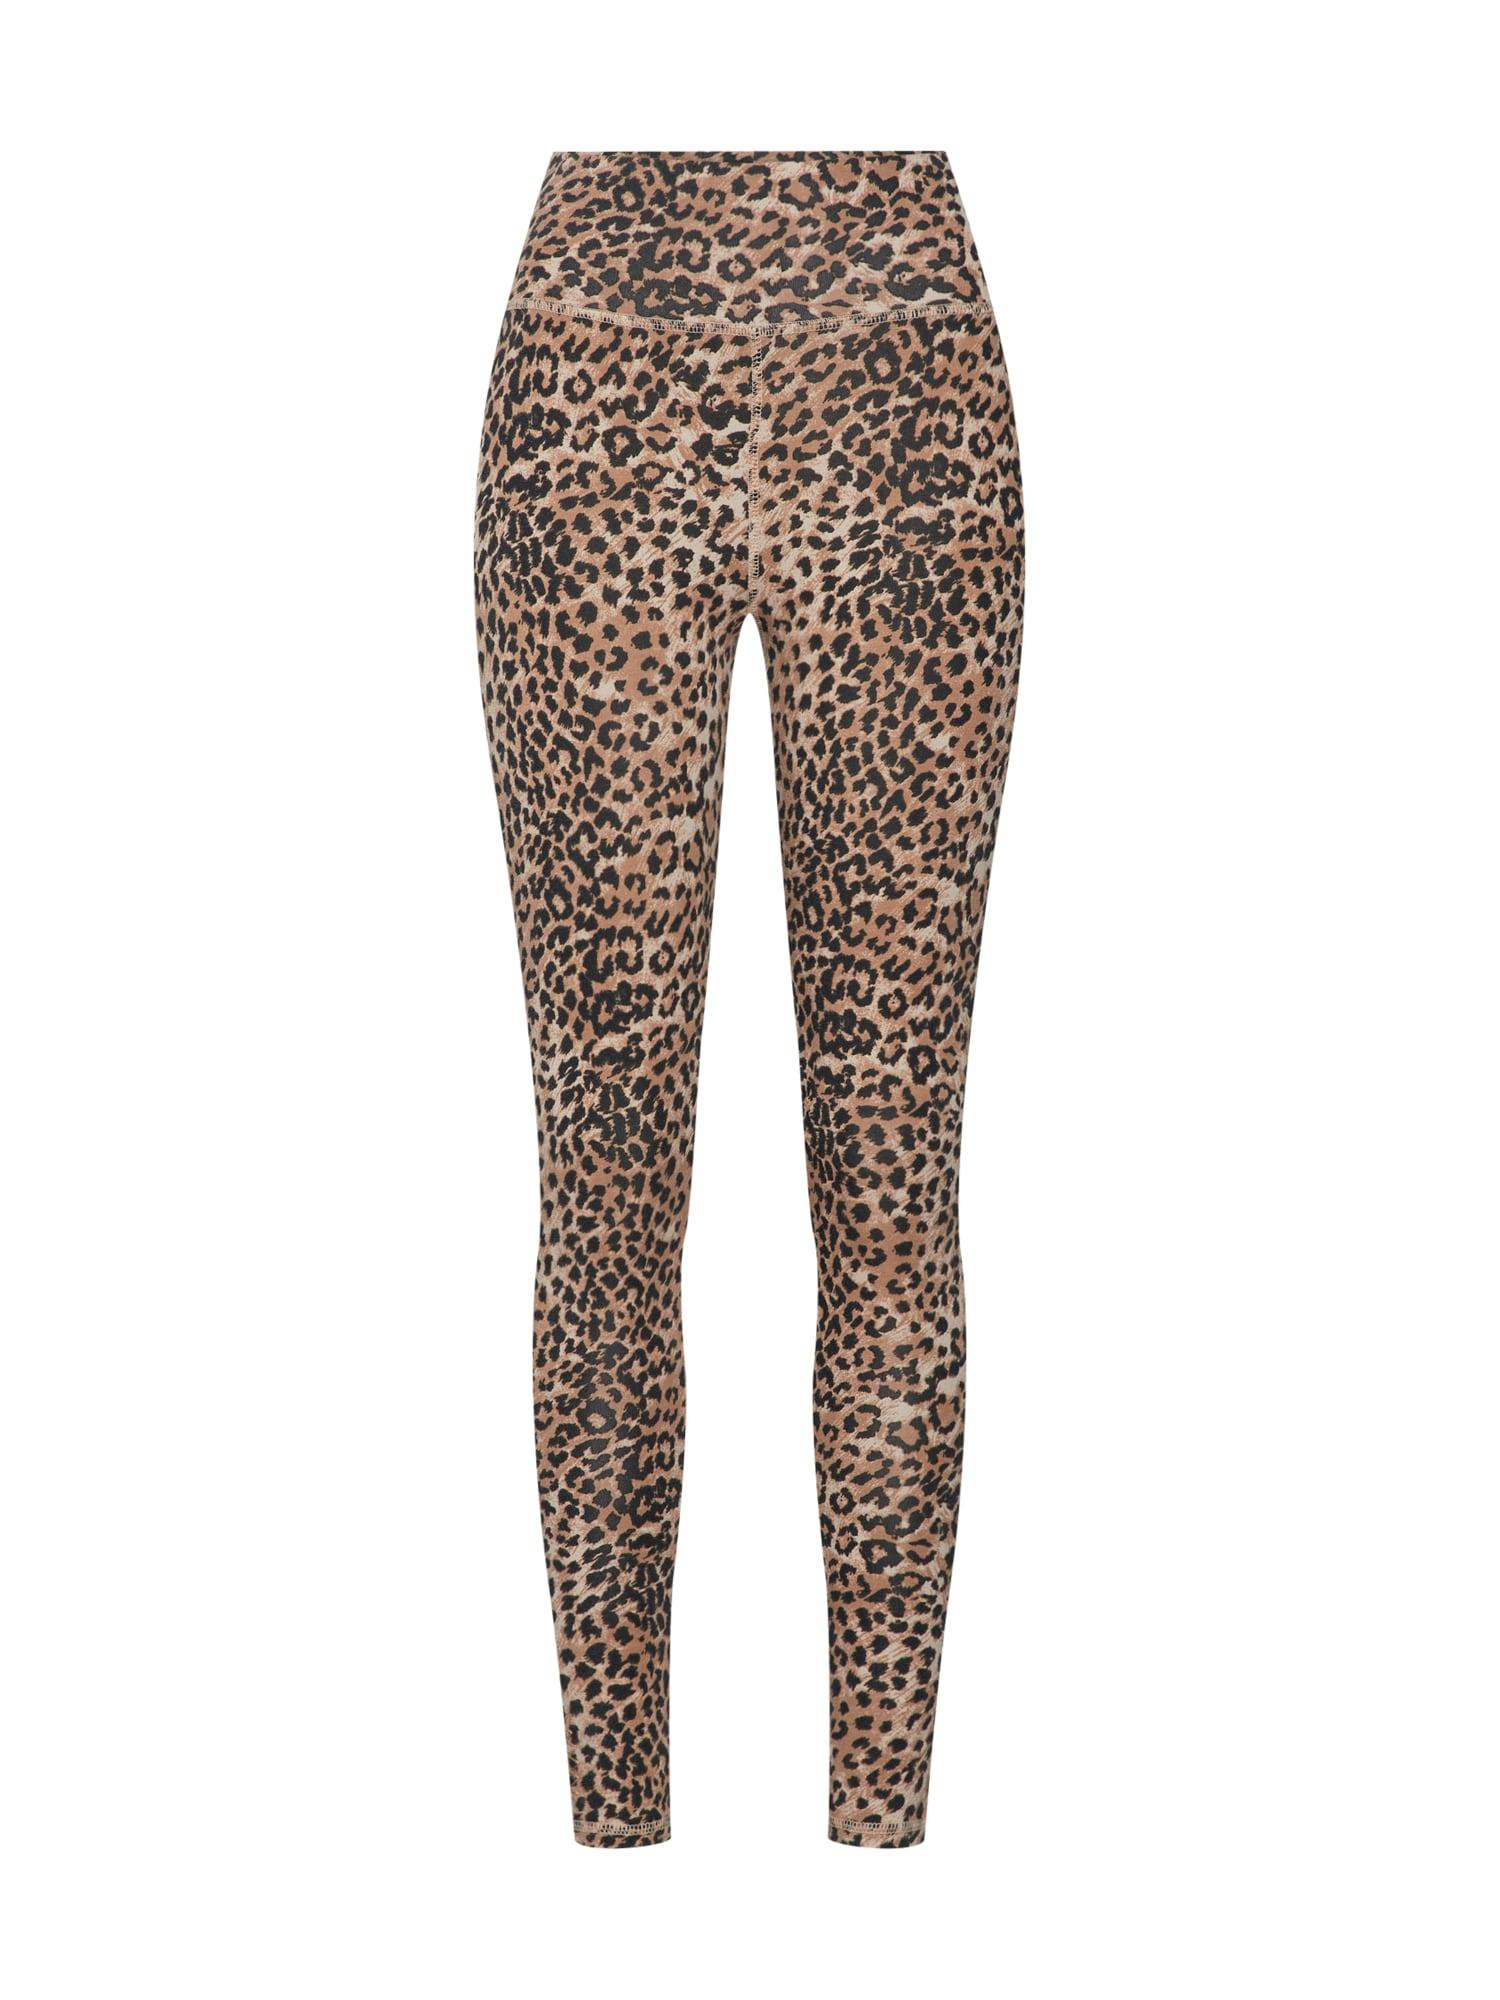 Legíny Leopard Leggings hnědá Ragdoll LA